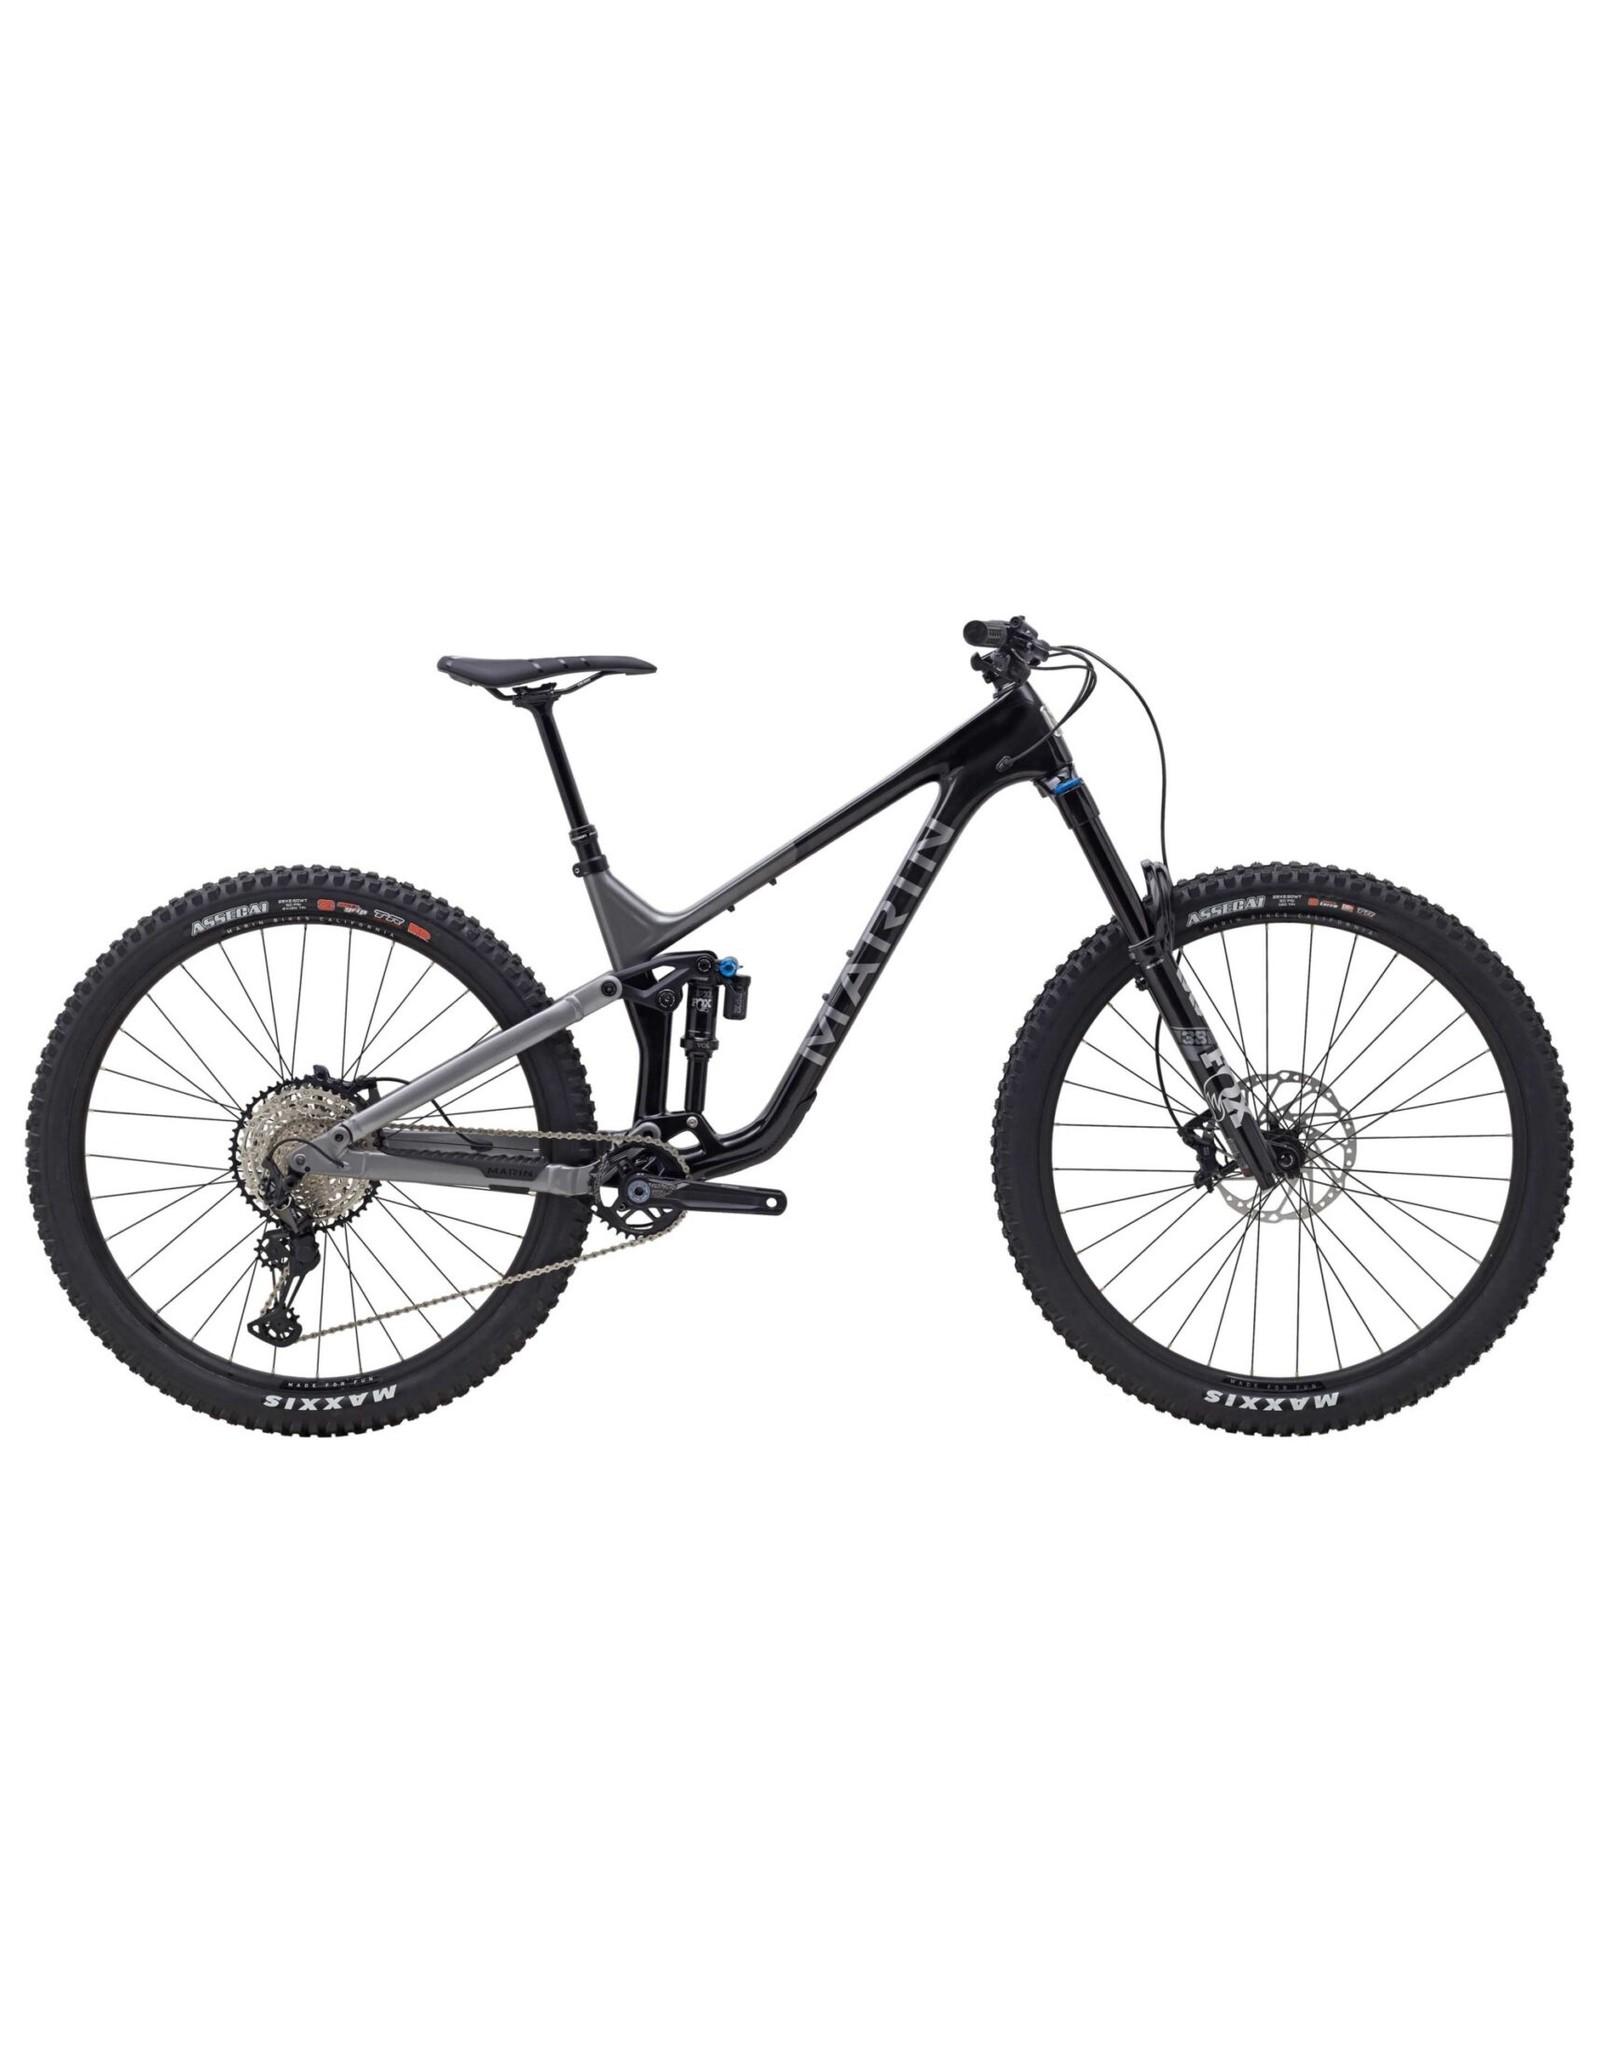 MARIN 2021 Alpine Trail C2